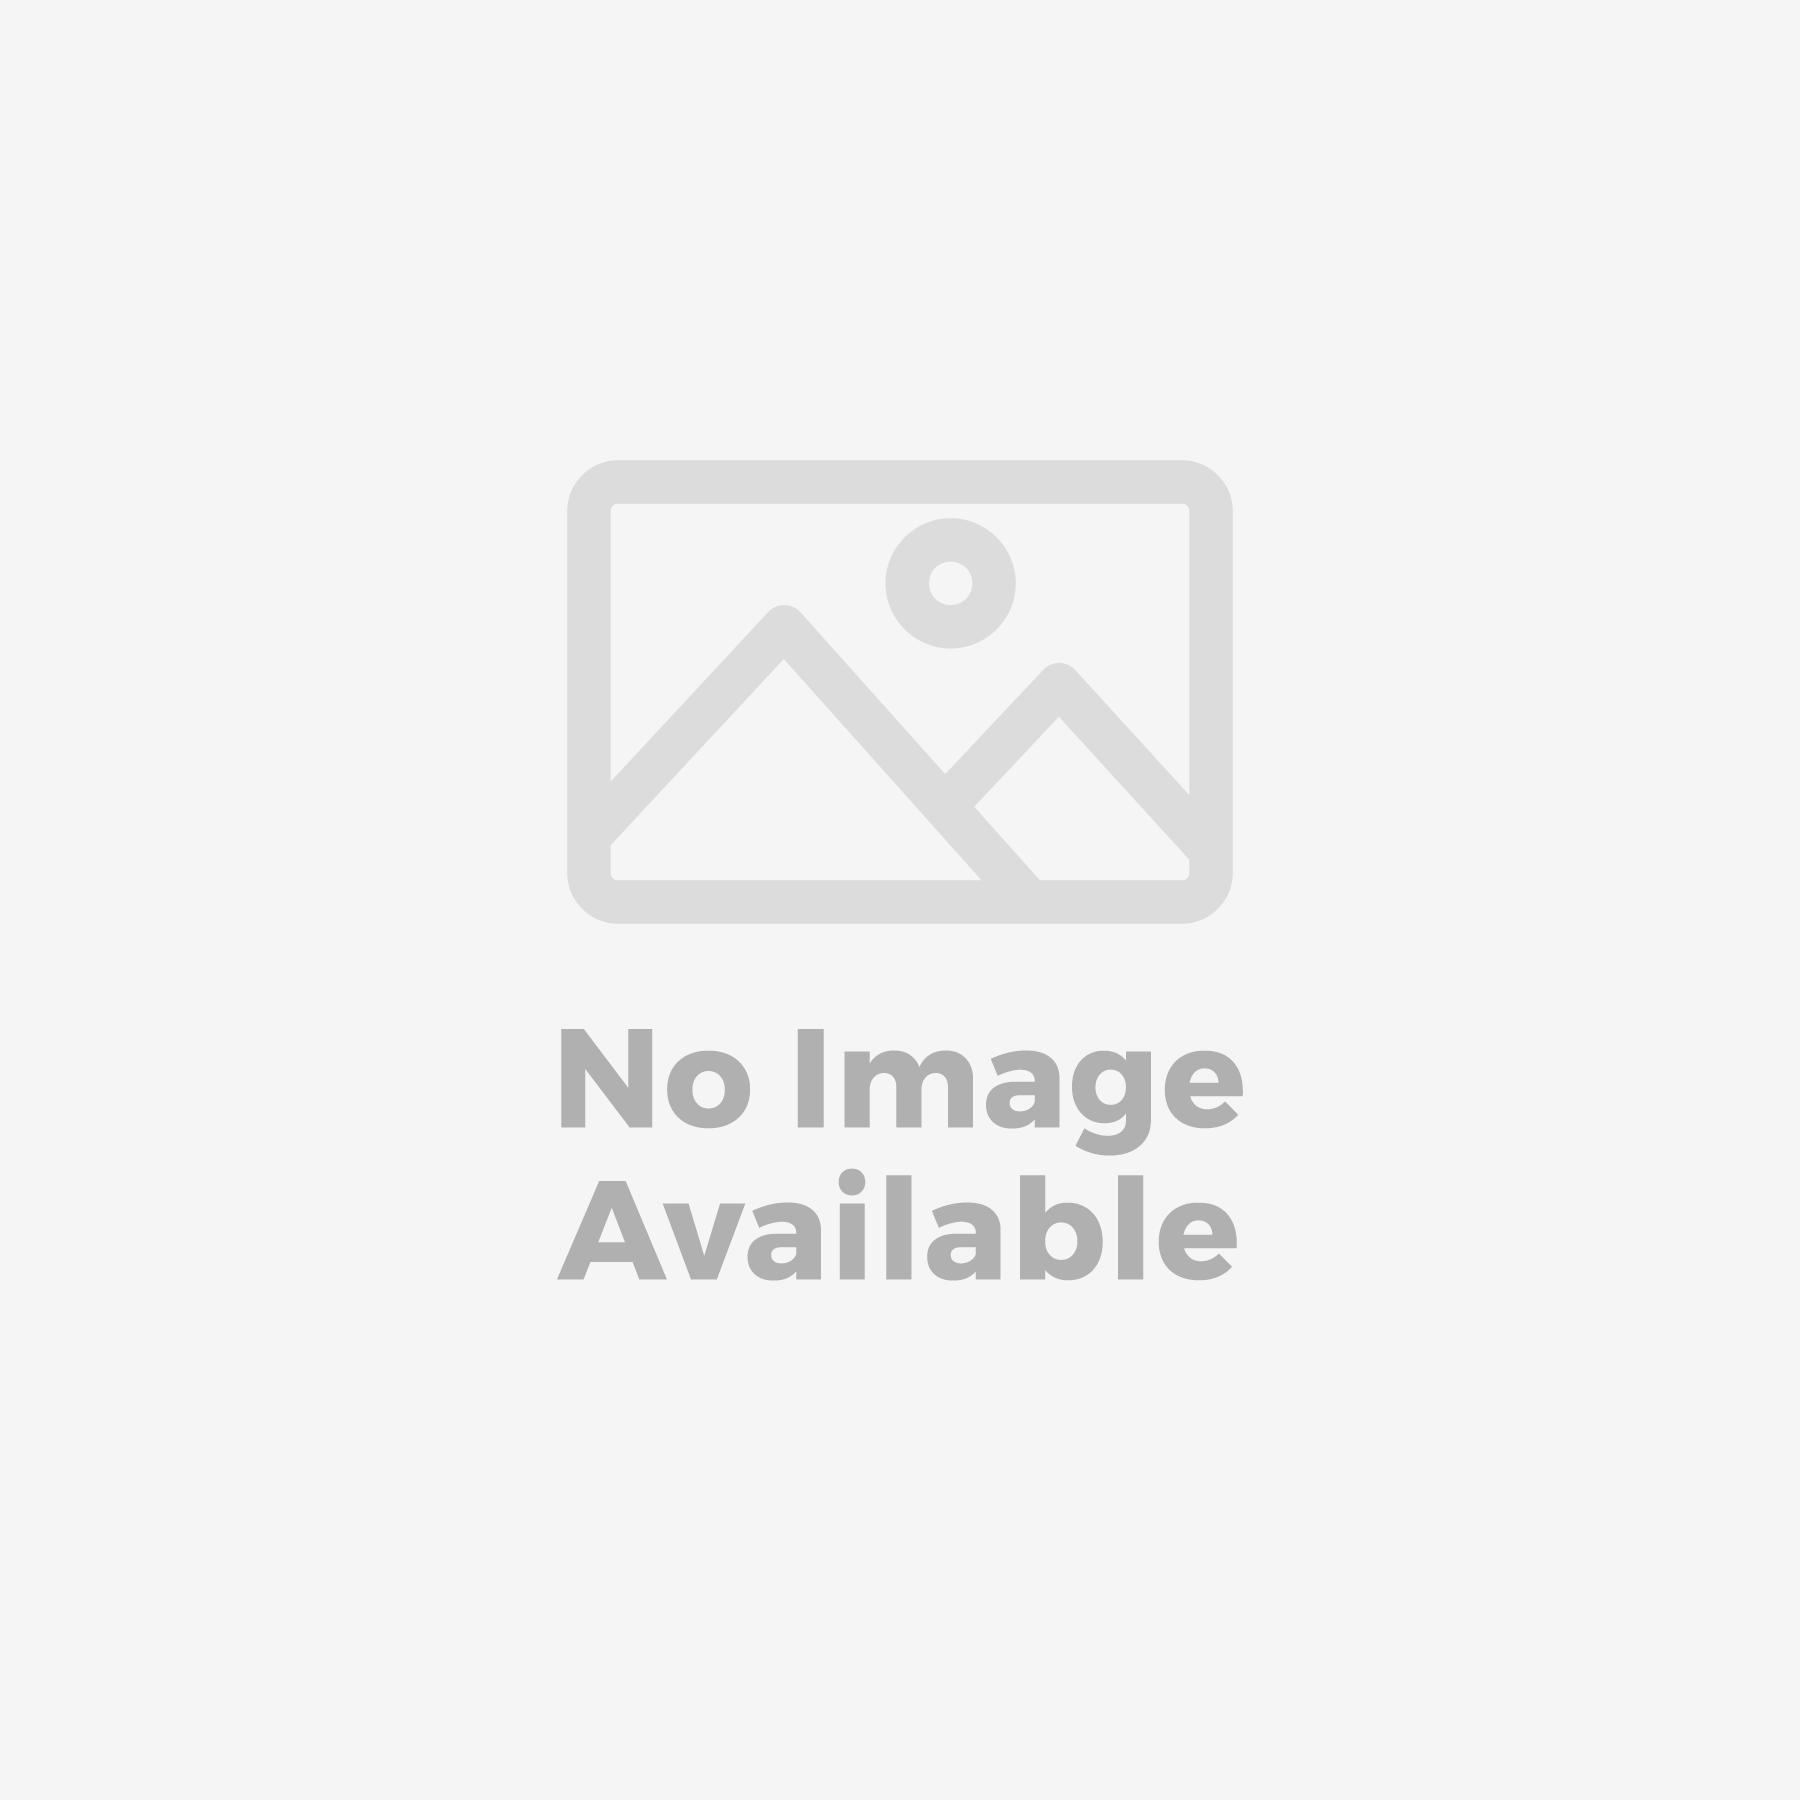 GRAVITY - Set 2 Whiskey Tumblers